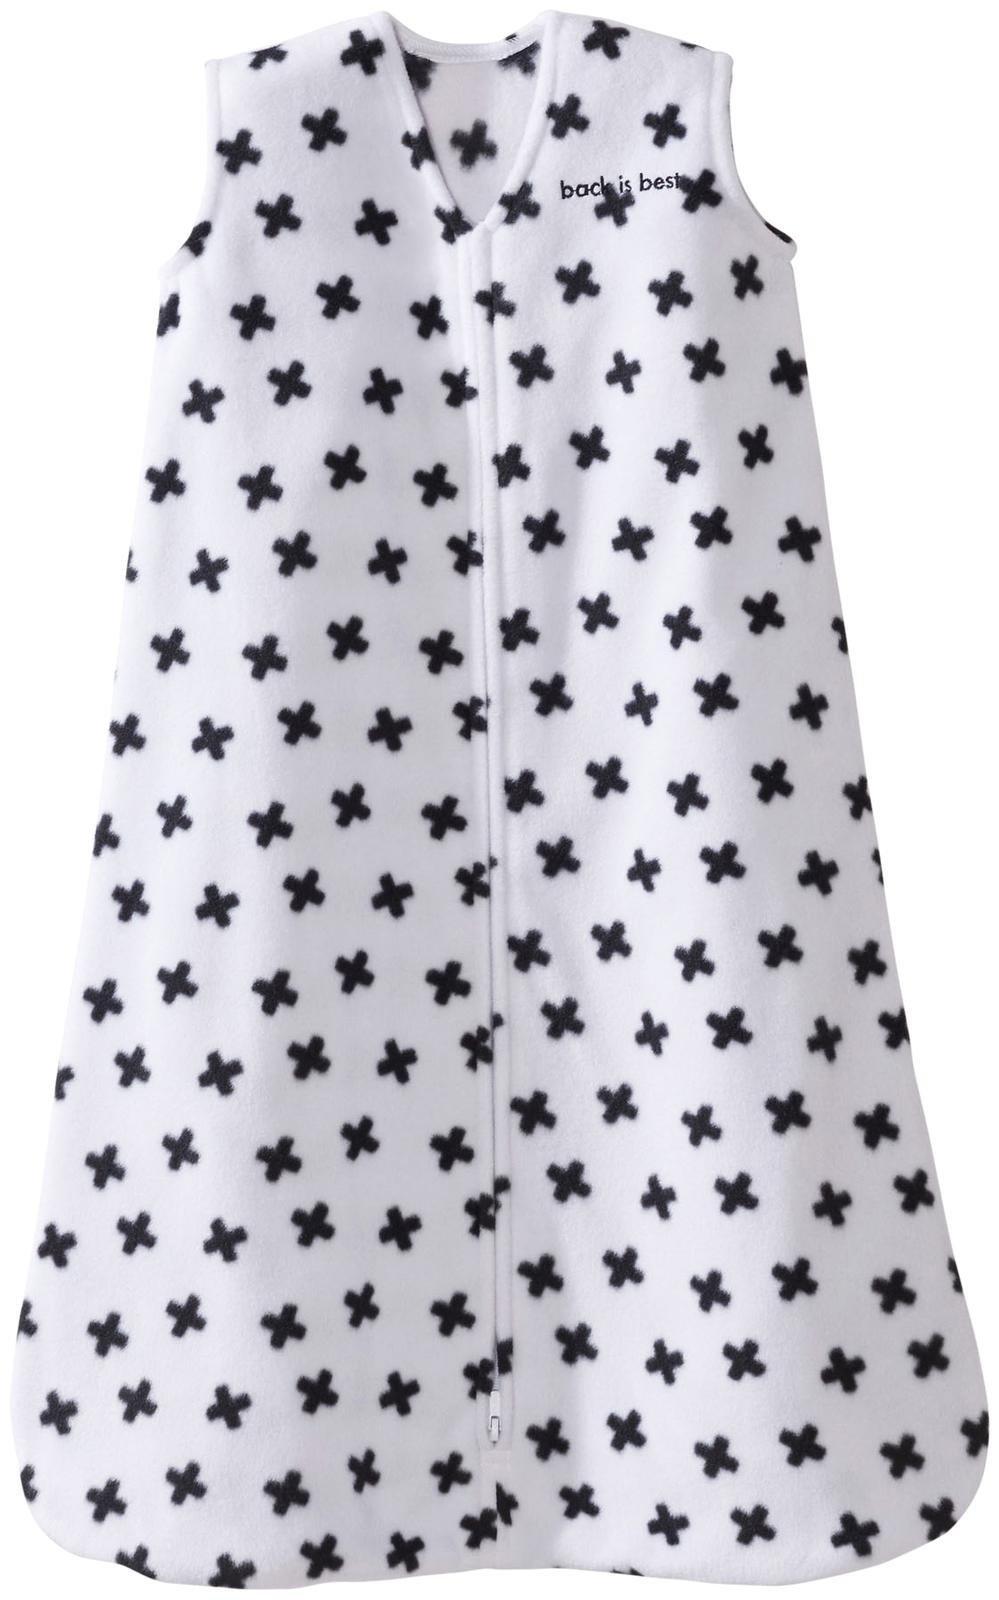 Halo Sleepsack, Micro-Fleece, Black and White Tossed Plus Signs, Small